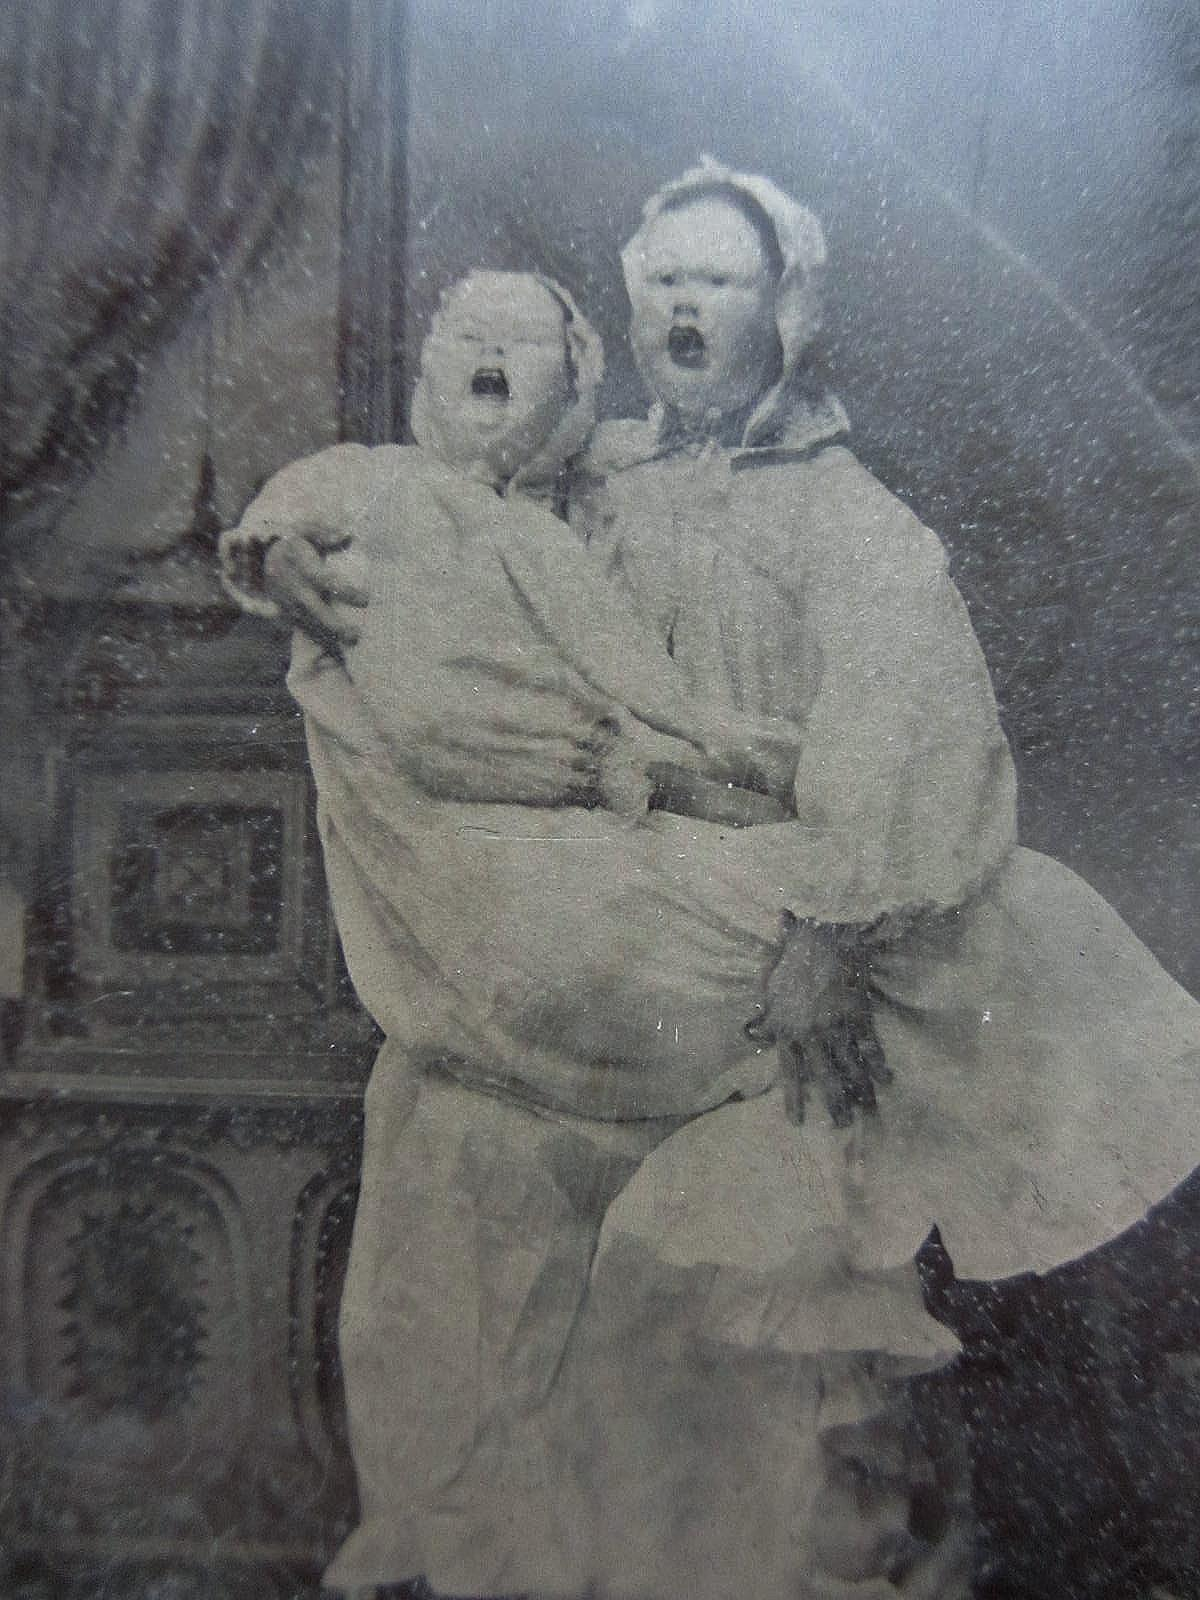 Creepy Vintage Halloween Photos  122 Pics Creepy Vintage Photography